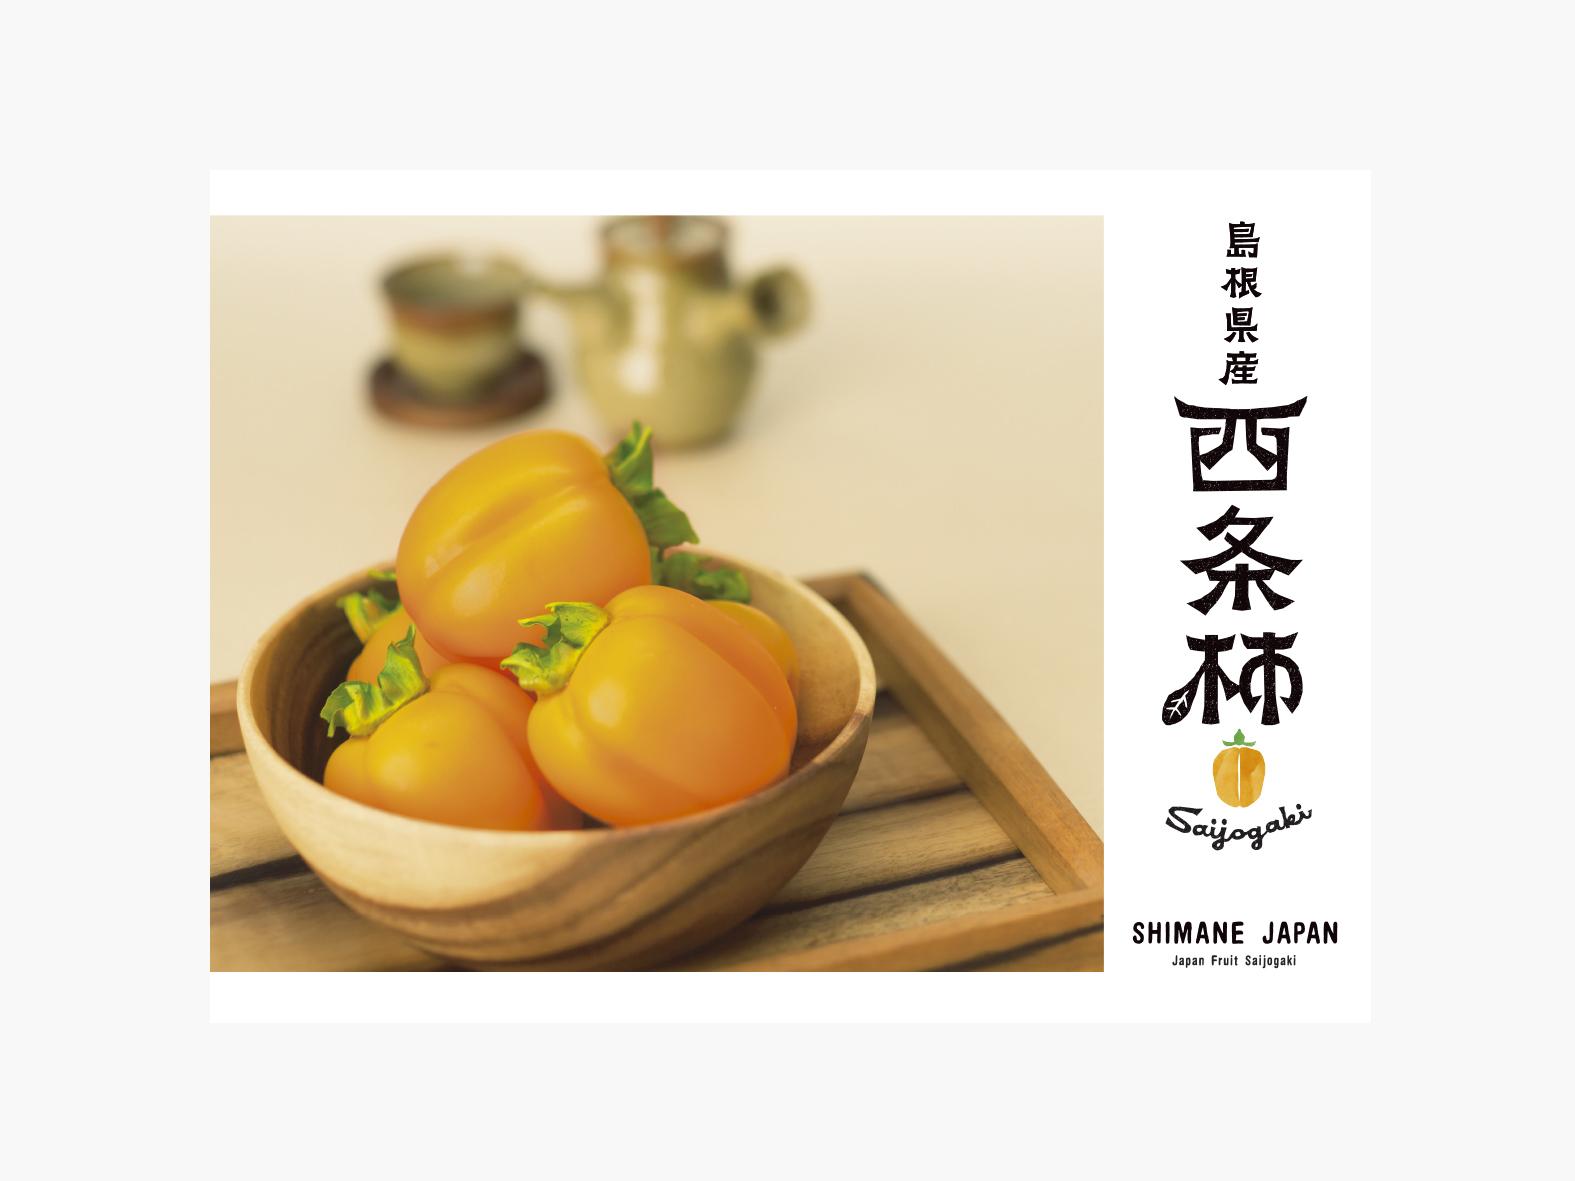 西条柿 海外向け広報(1)